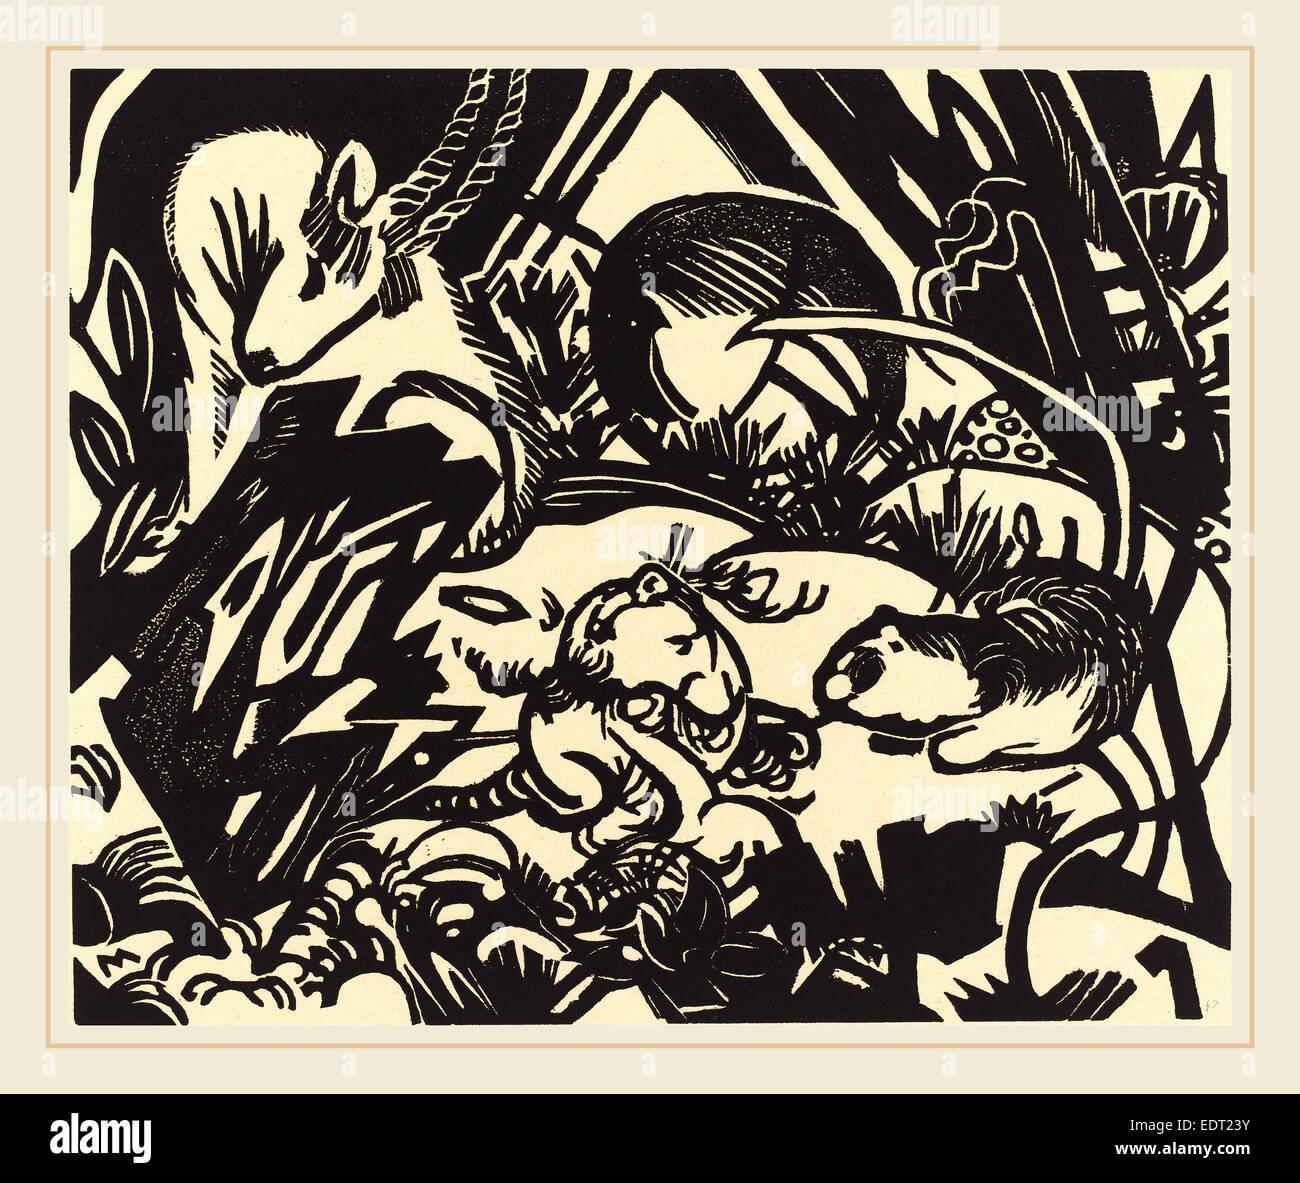 Franz Marc, Animal Legend (Tierlegende), German, 1880-1916, 1912, woodcut - Stock Image